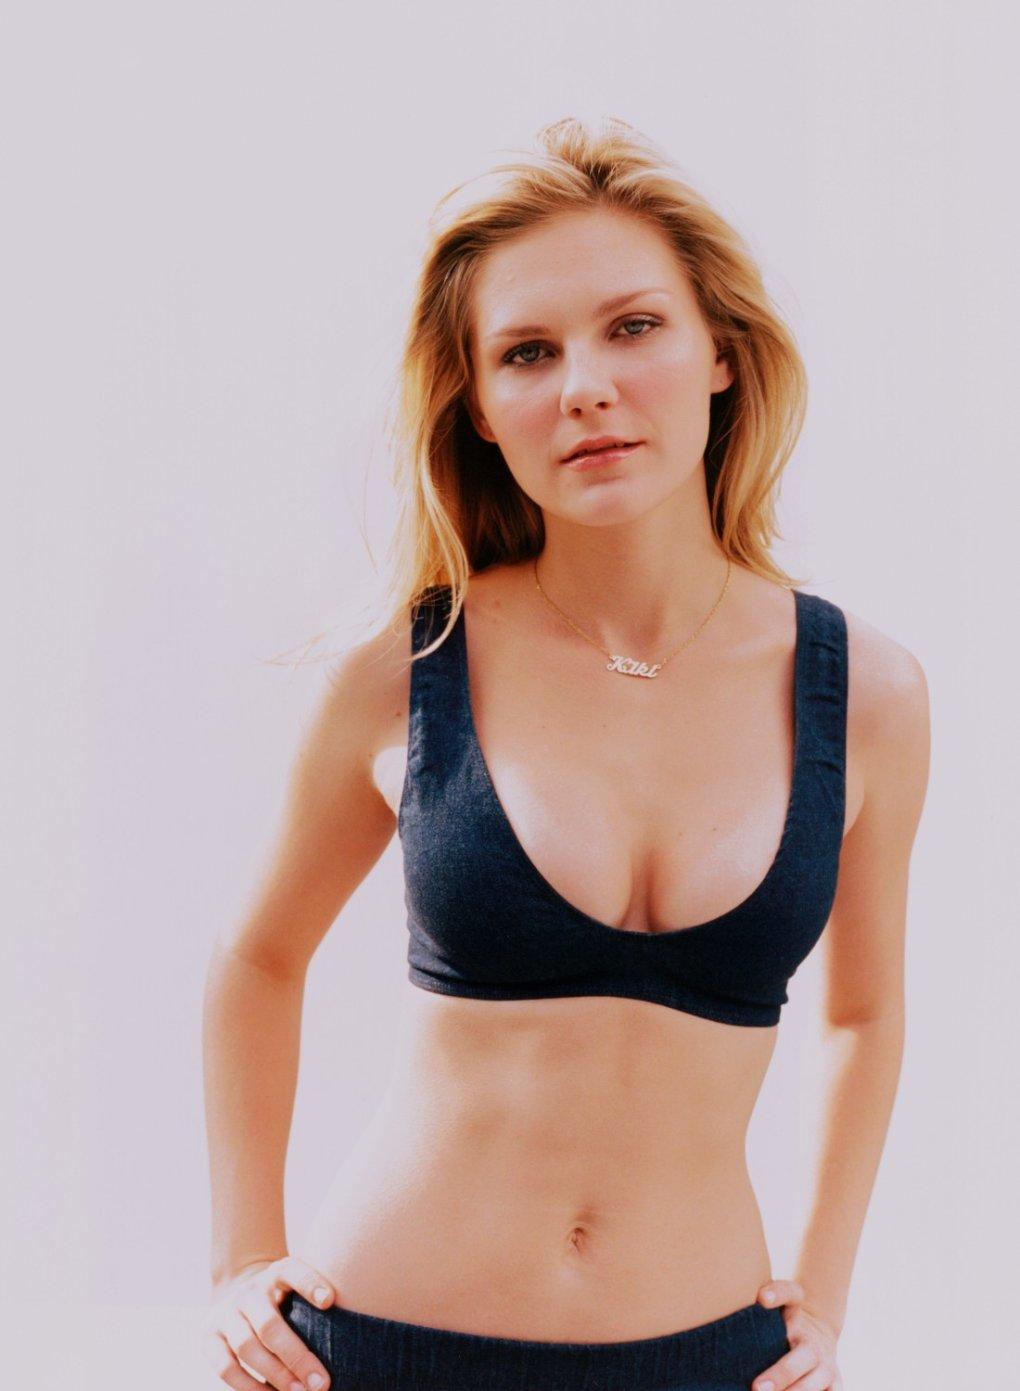 20 Hot And Sexy Kirsten Dunst Photos - Barnorama